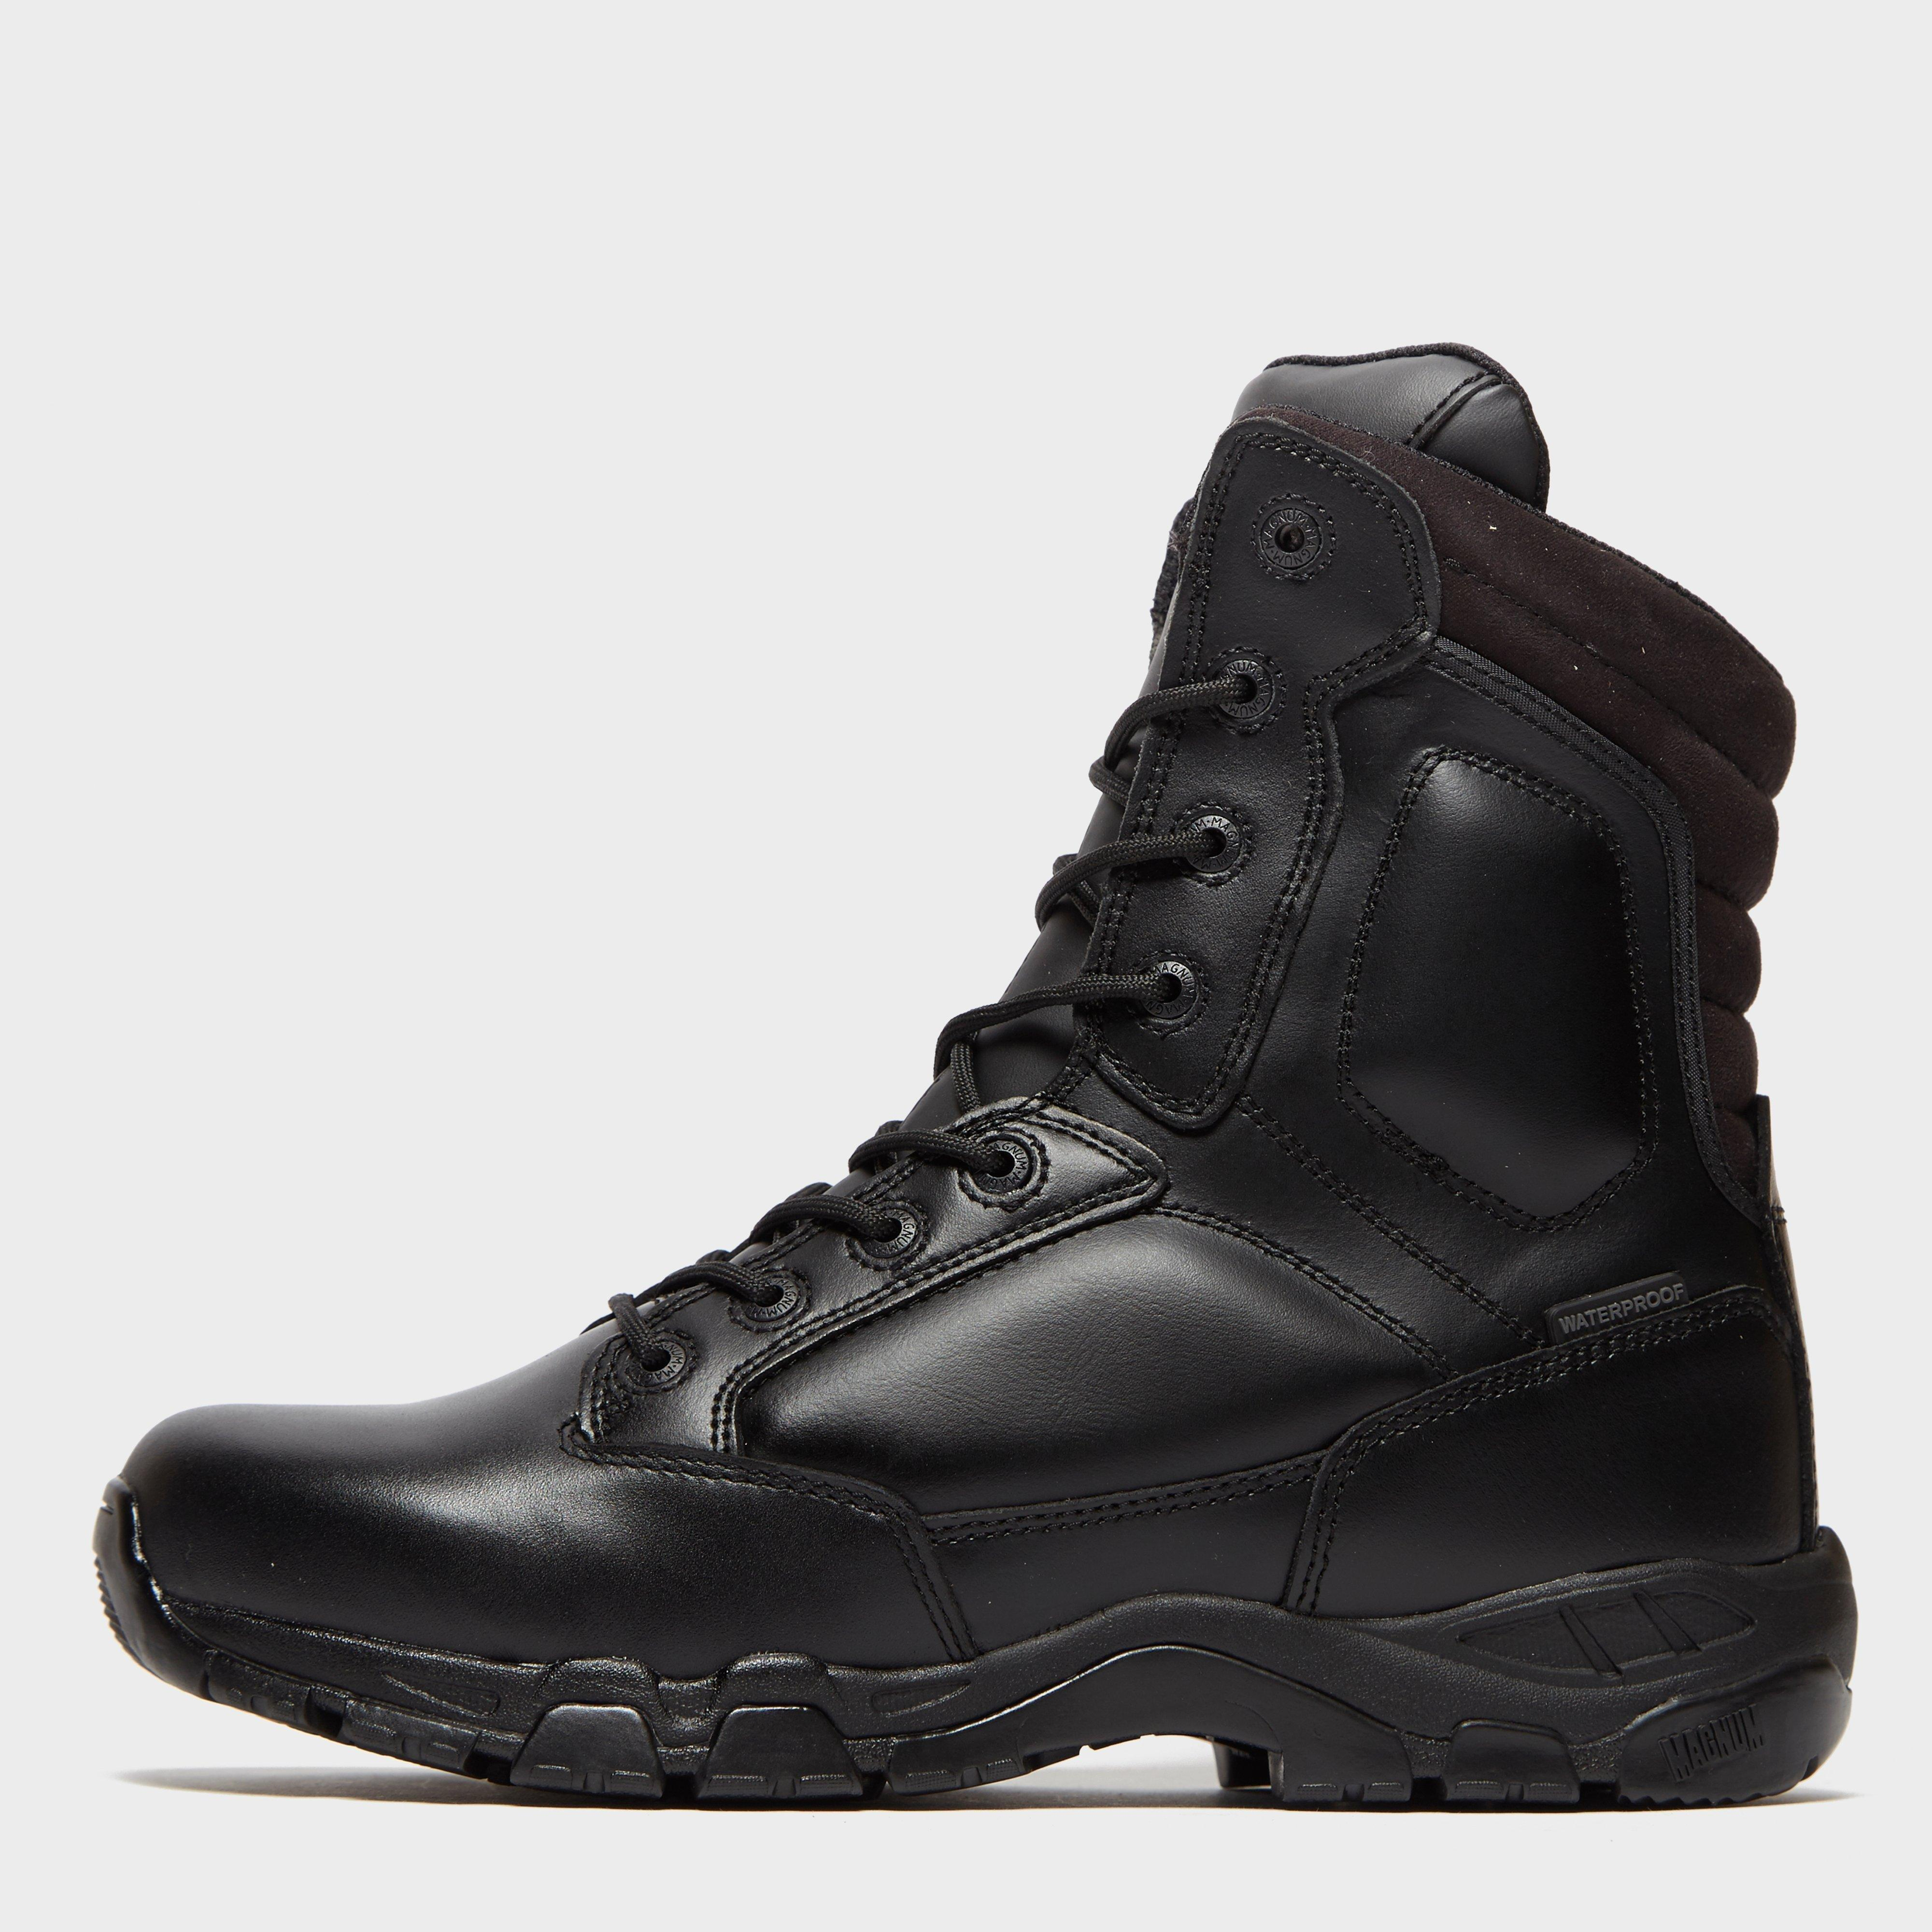 magnum Magnum Mens Viper Pro Waterproof All Leather Work Boot - Black, Black